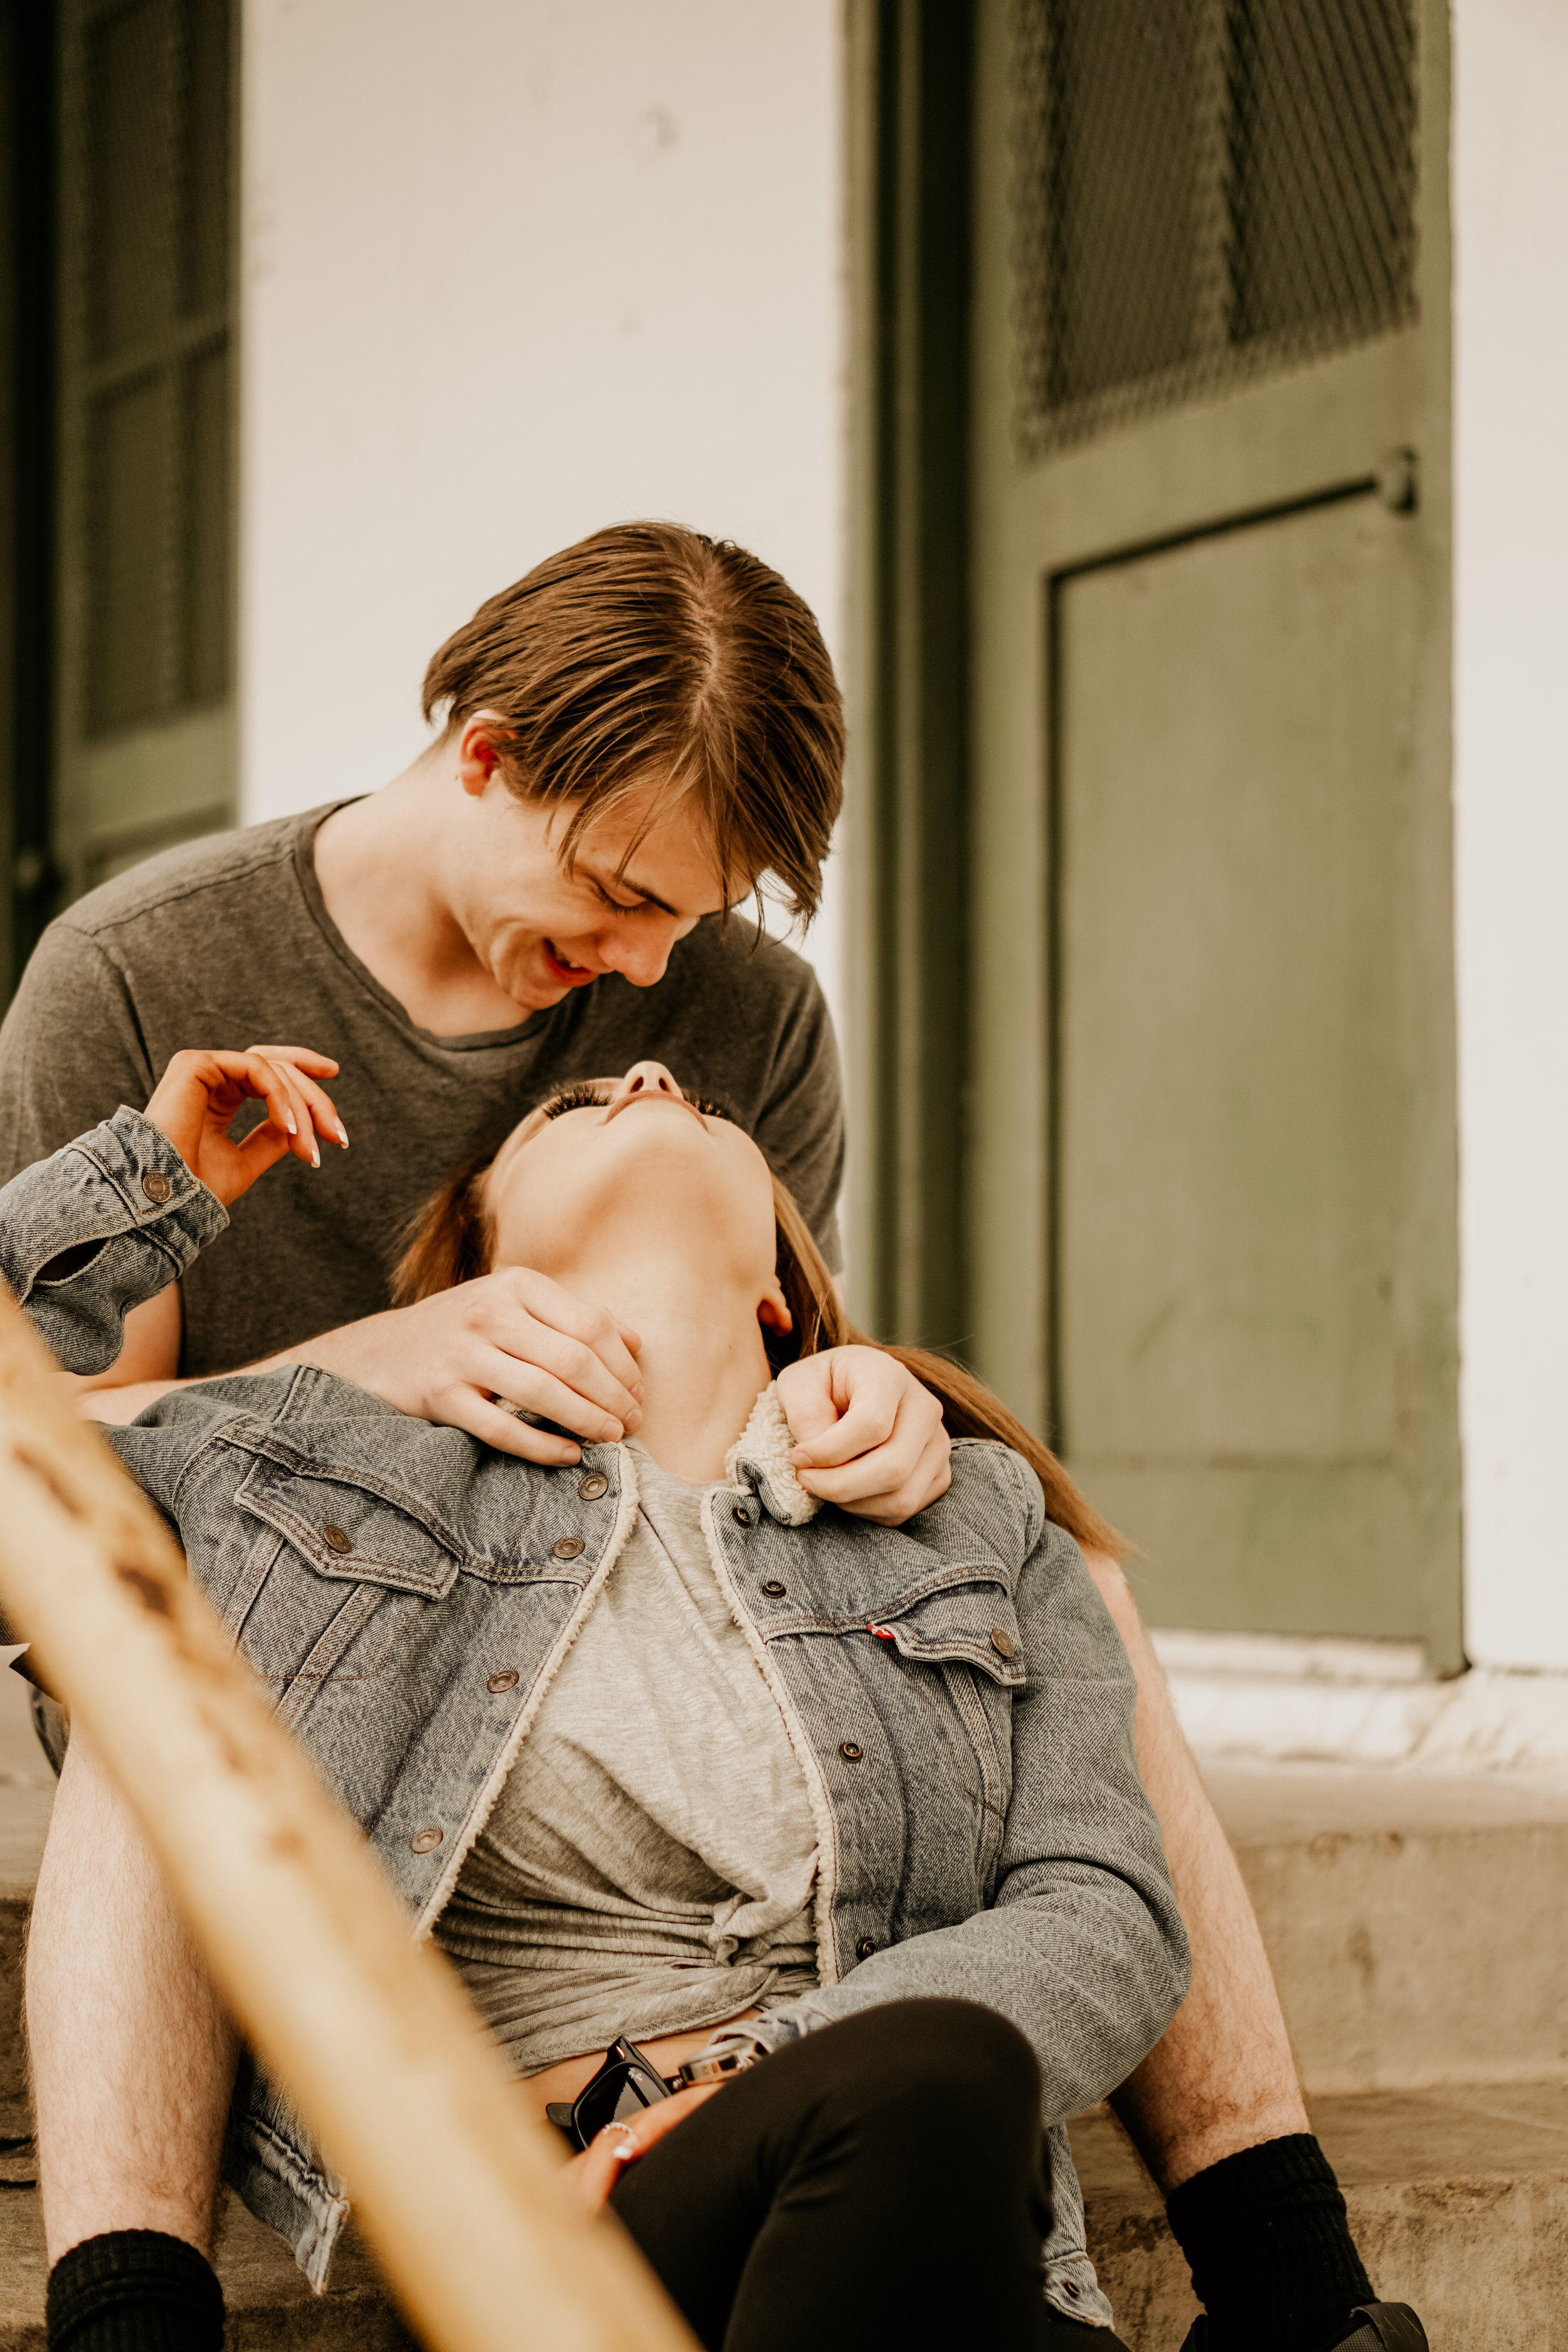 couple-elopement-engagement-wedding-love-little-rock-arkansas-photographer-erin-venable-photography-bride-groom-palm-springs-california-dessert